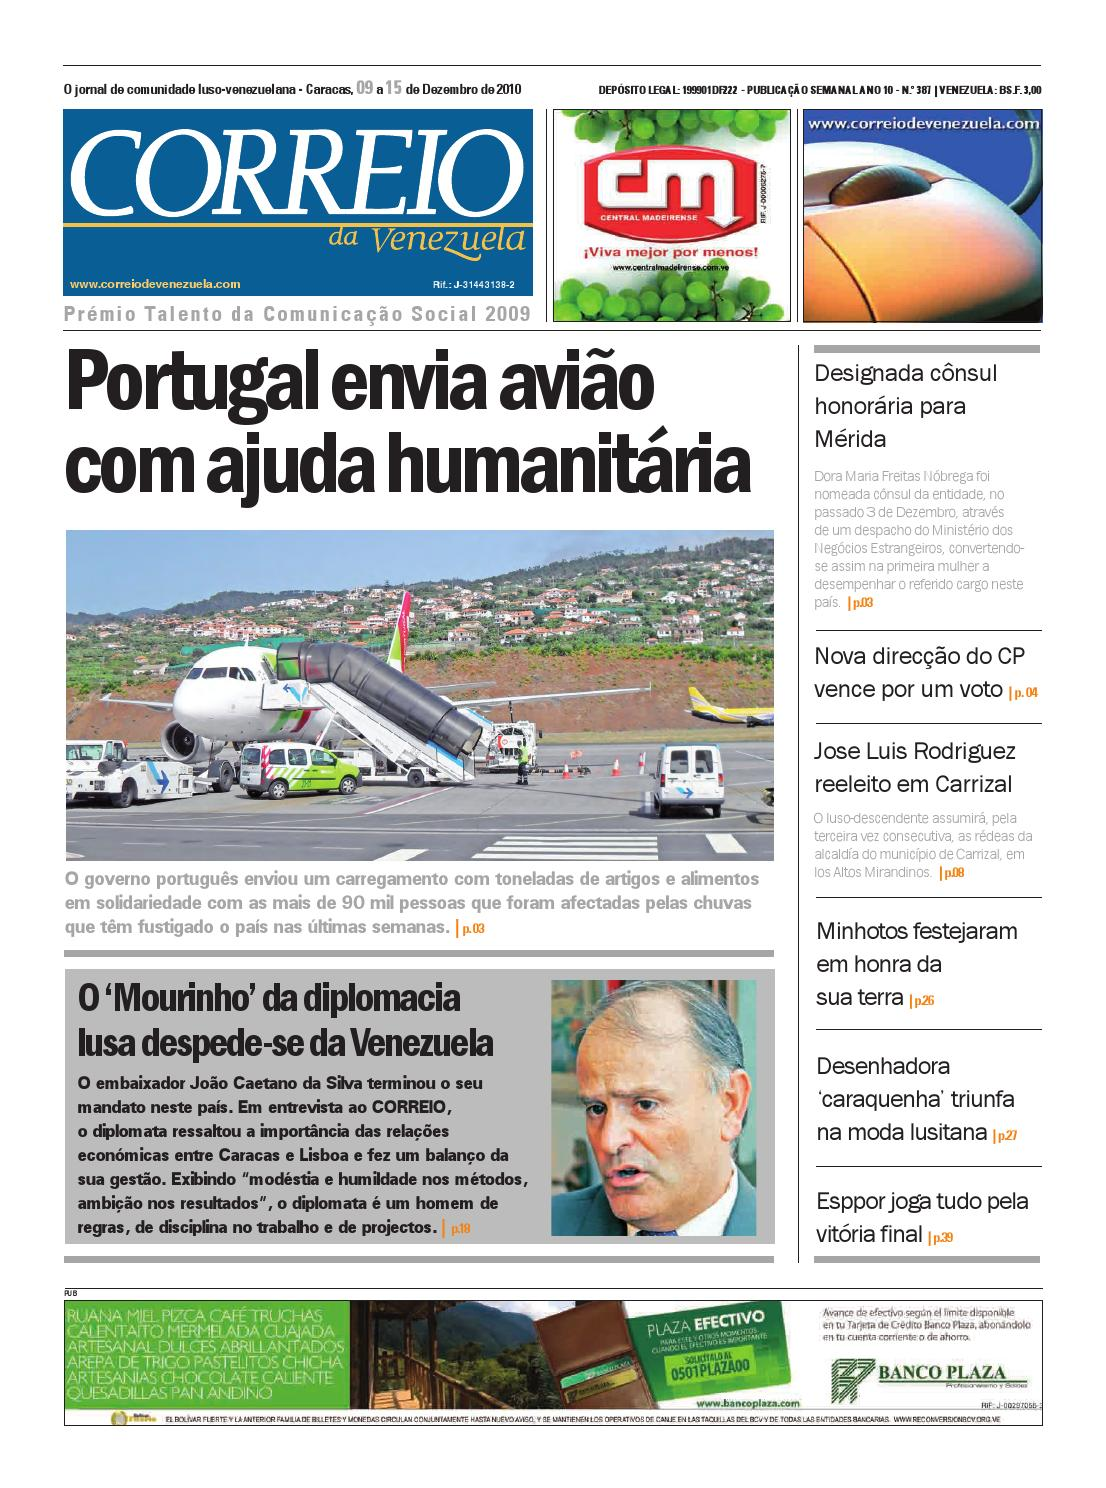 Correio da Venezuela 387 by Correio da Venezuela - issuu 3554292785a21